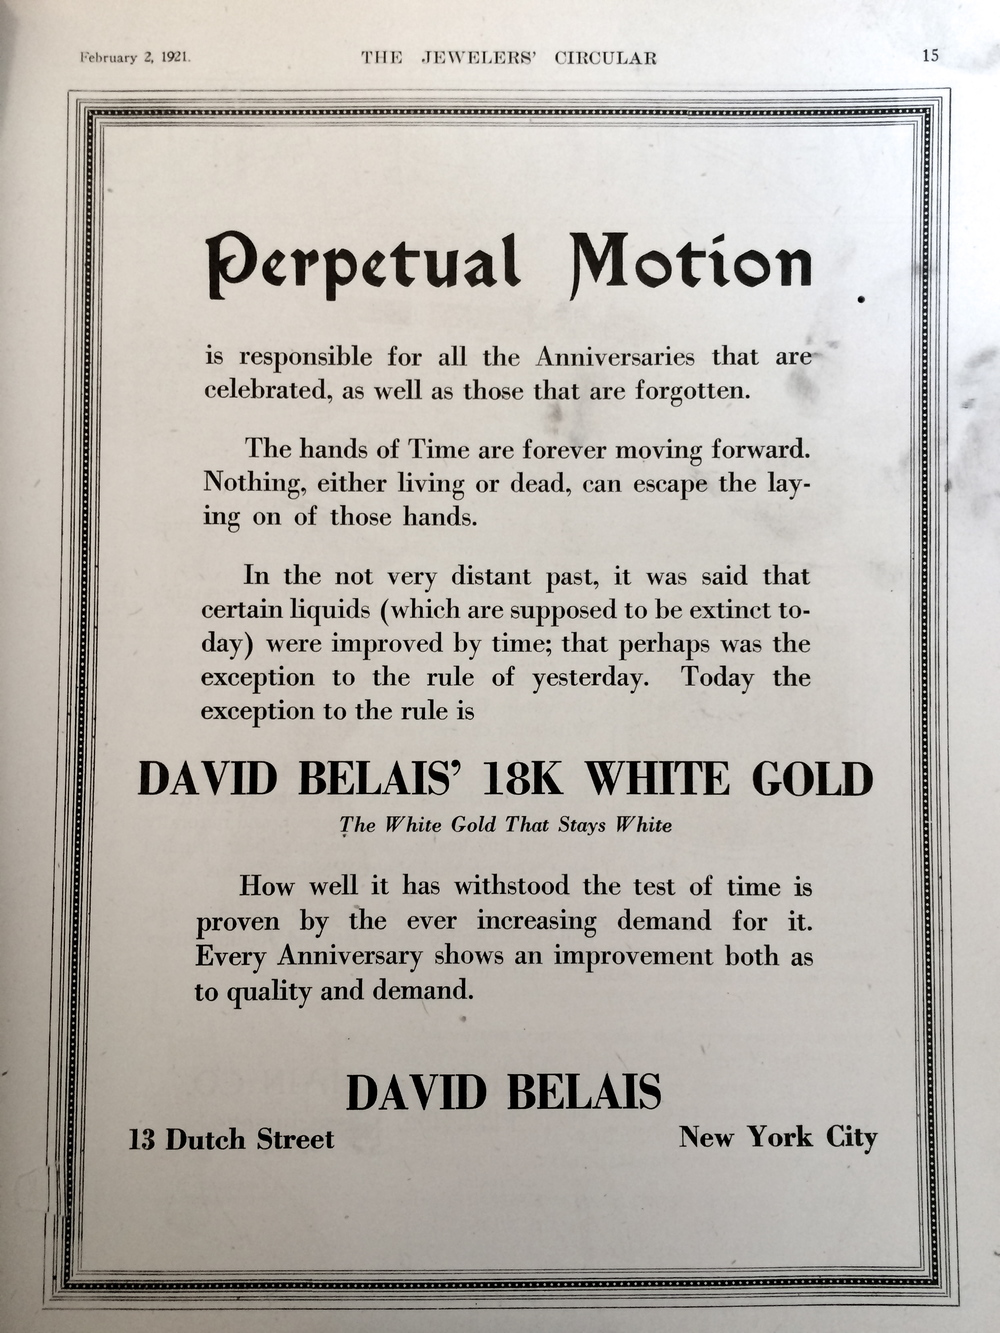 """David Belais'18k White Gold. The White Gold That Stays White"""